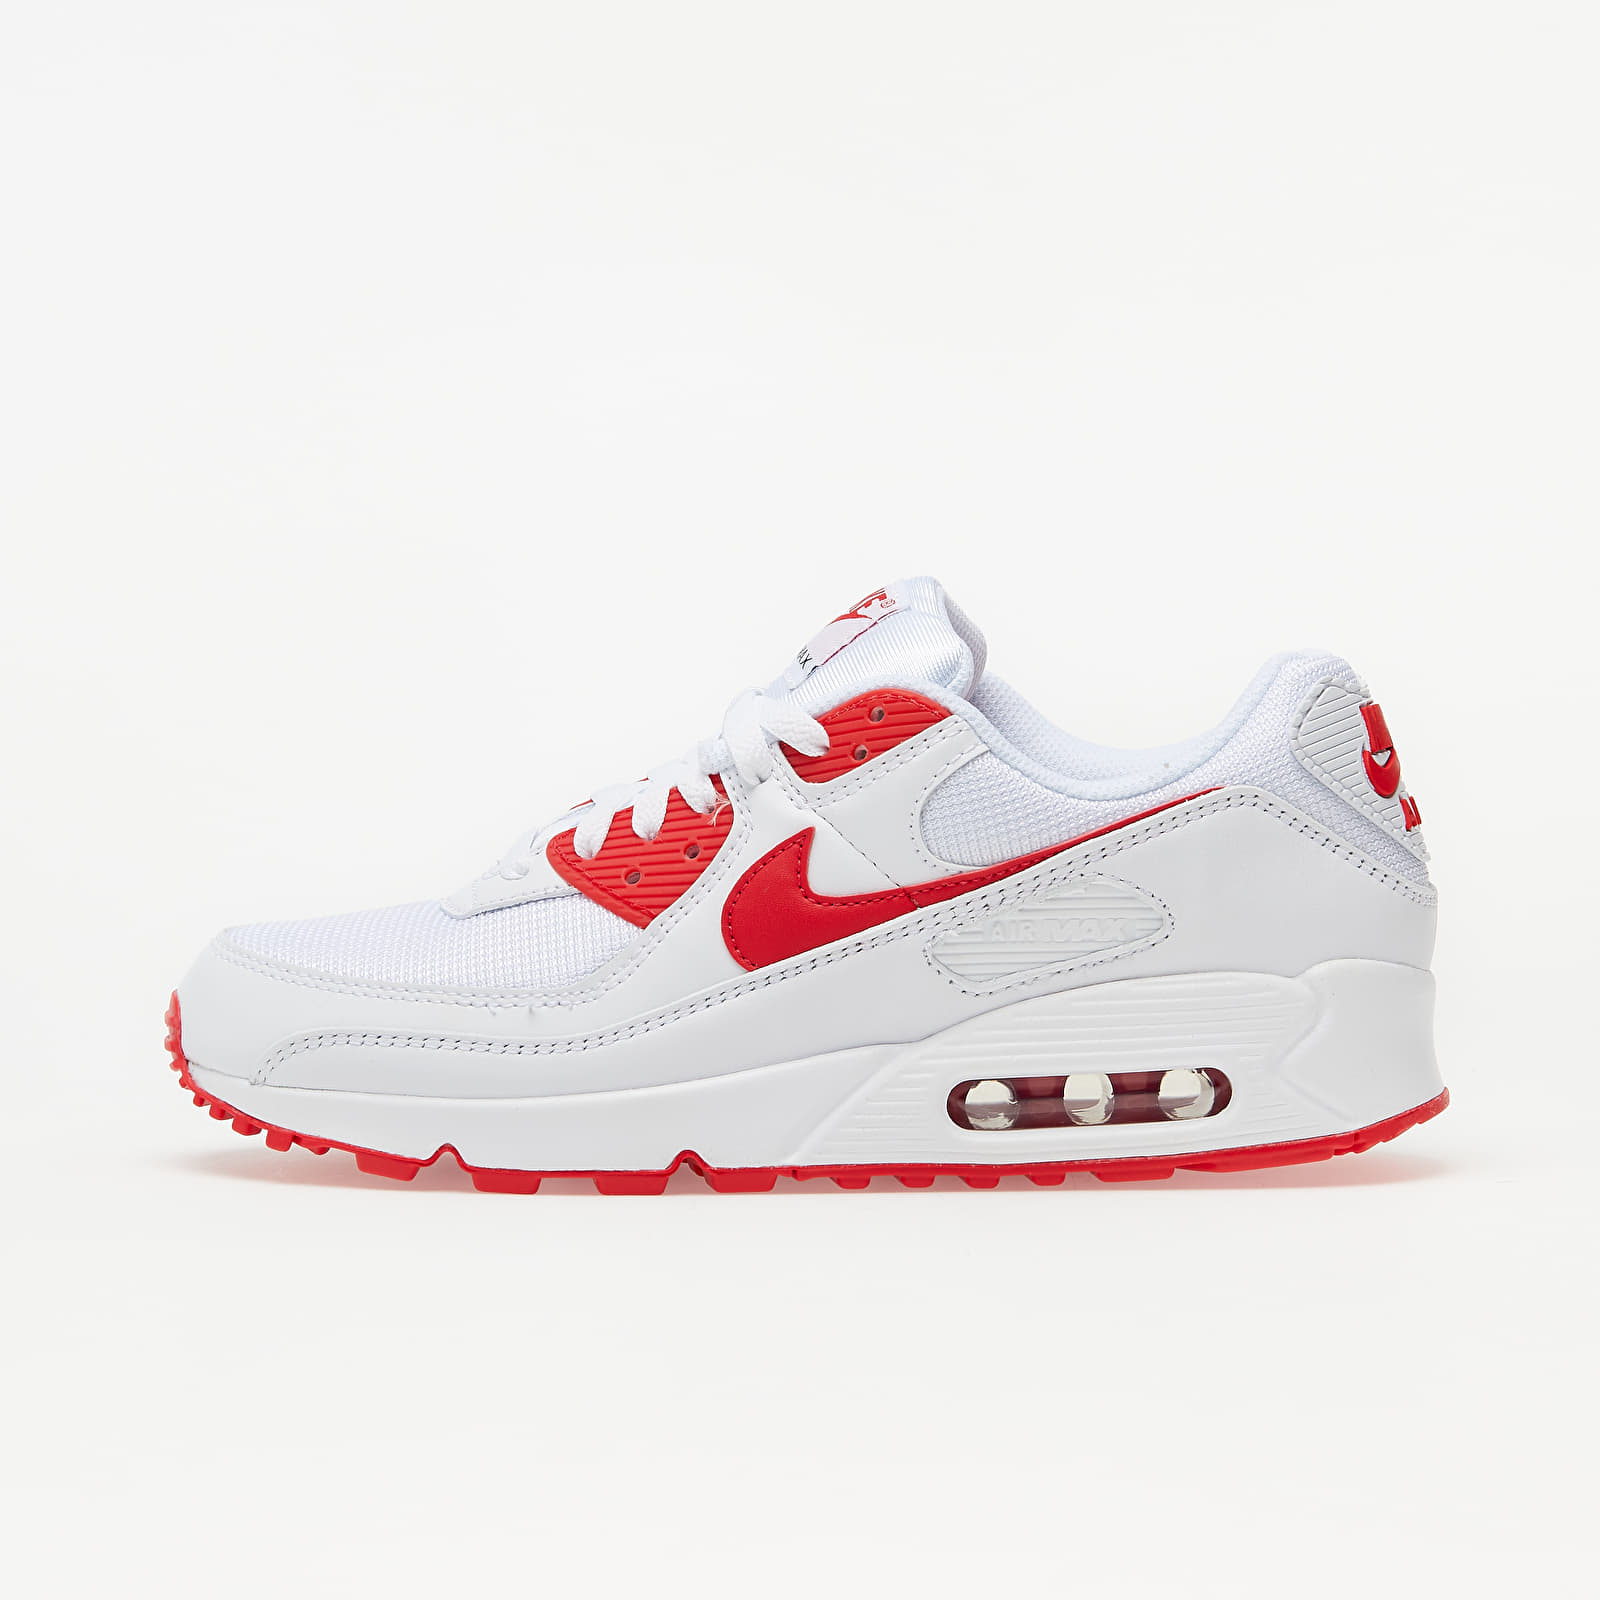 Nike Air Max 90 White/ Hyper Red-Black CT1028-101